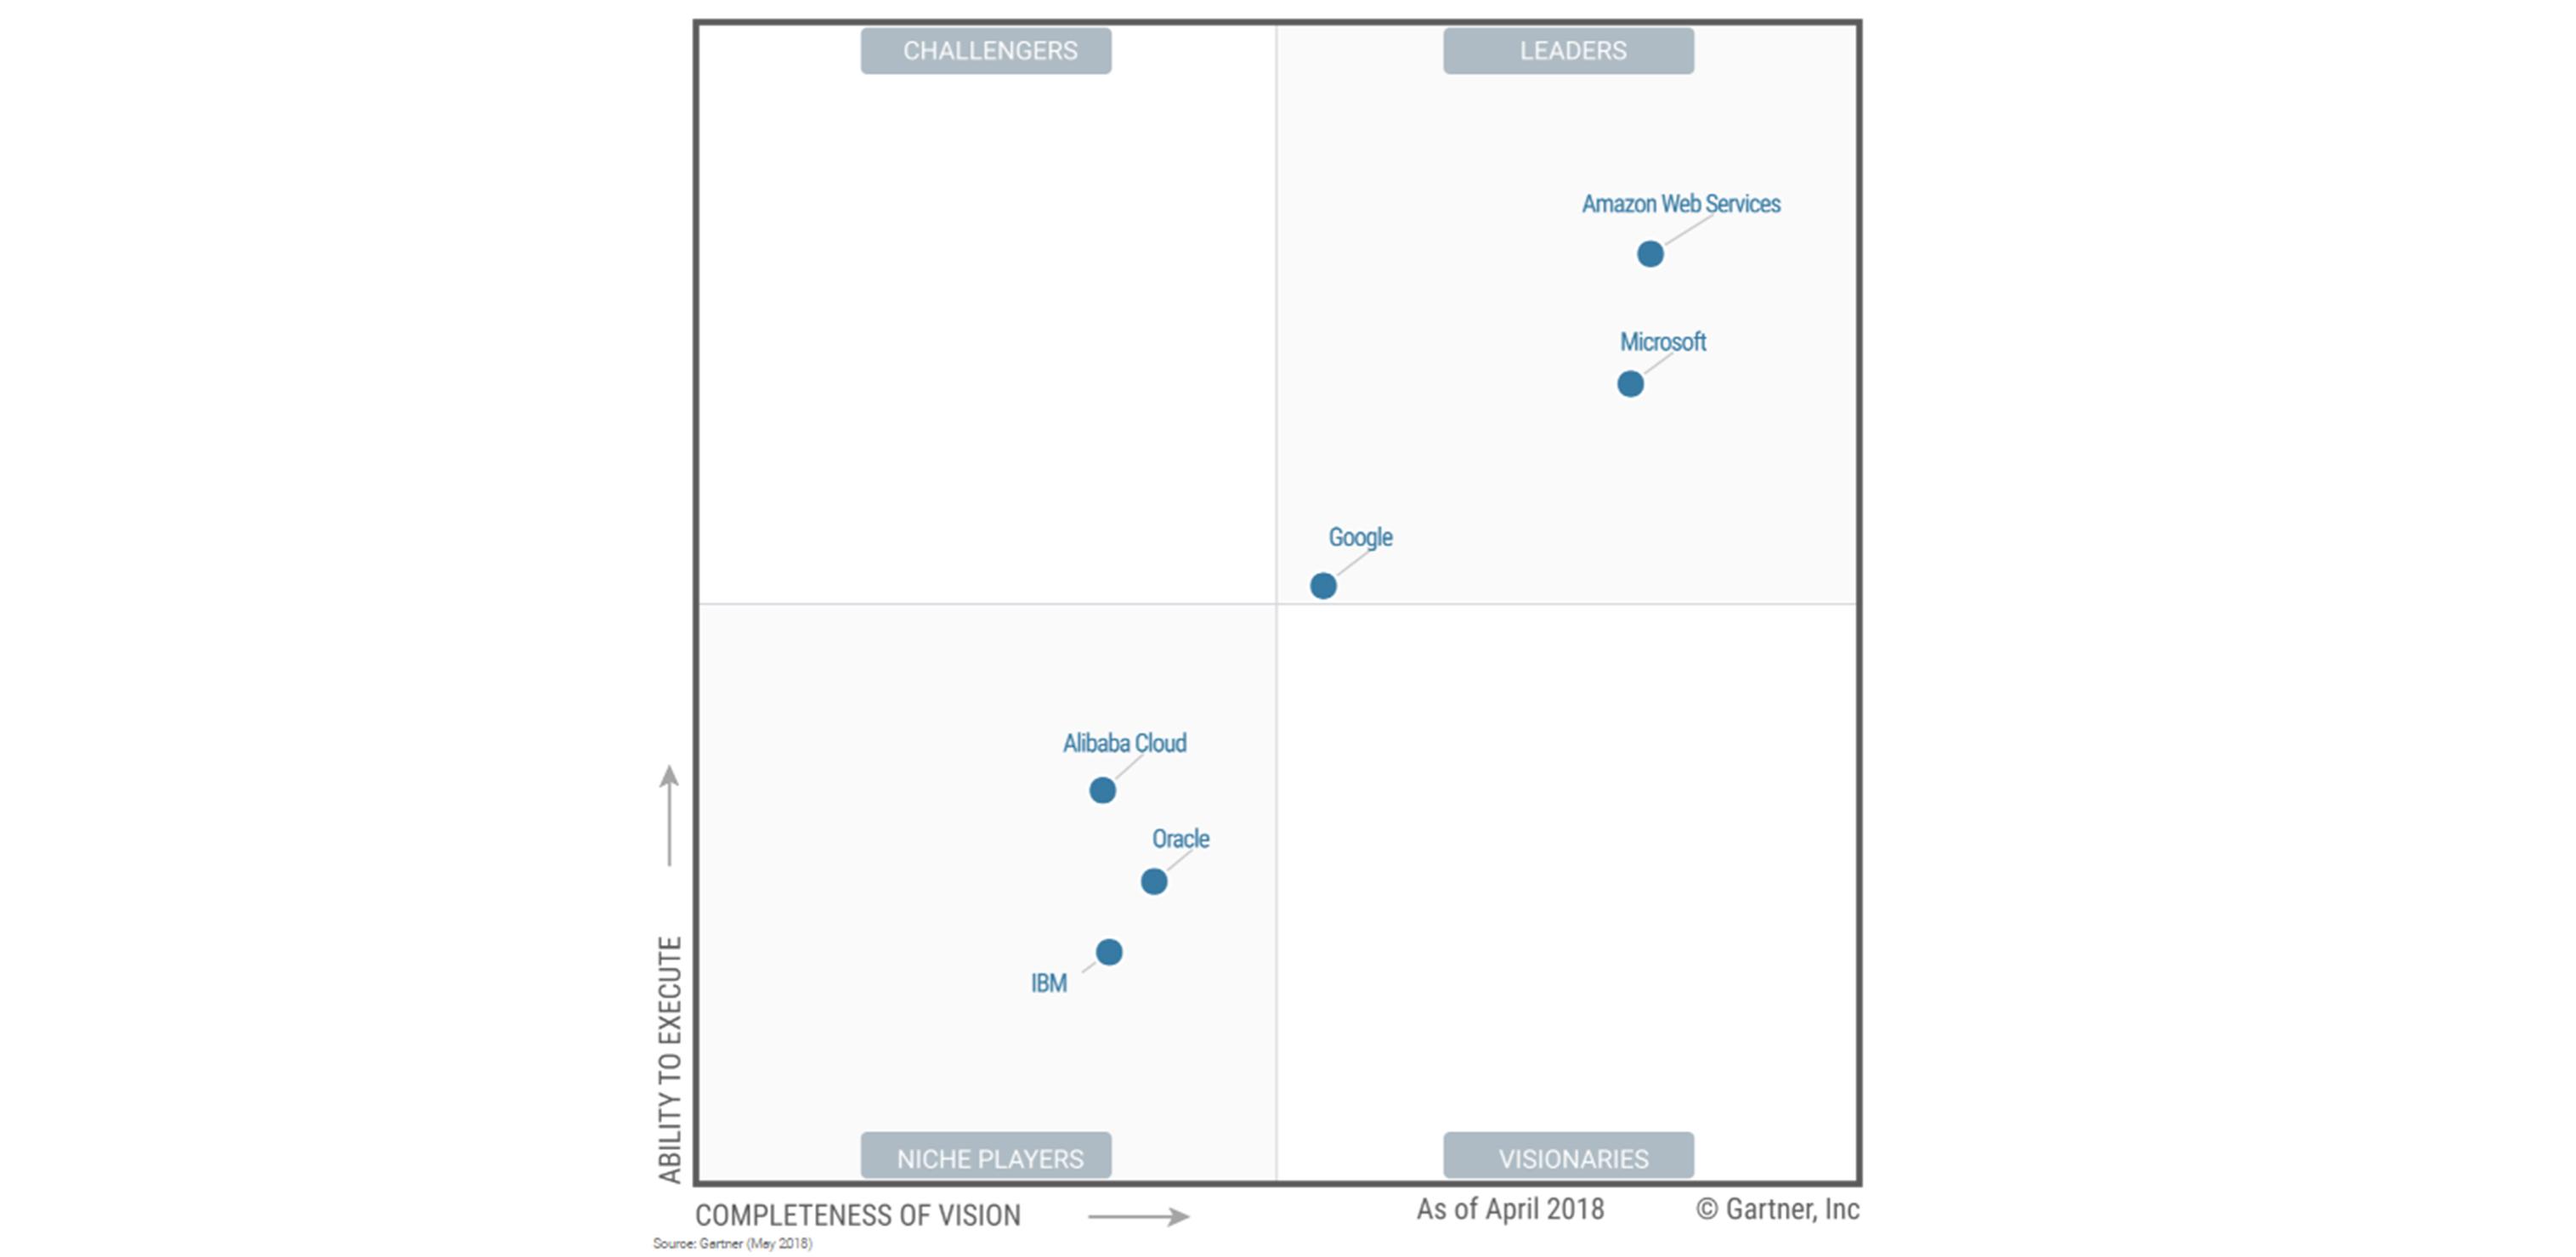 gartner_inc._magic_quadrant_for_cloud_infrastructure_as_a_service_worldwide_2018_0.jpg